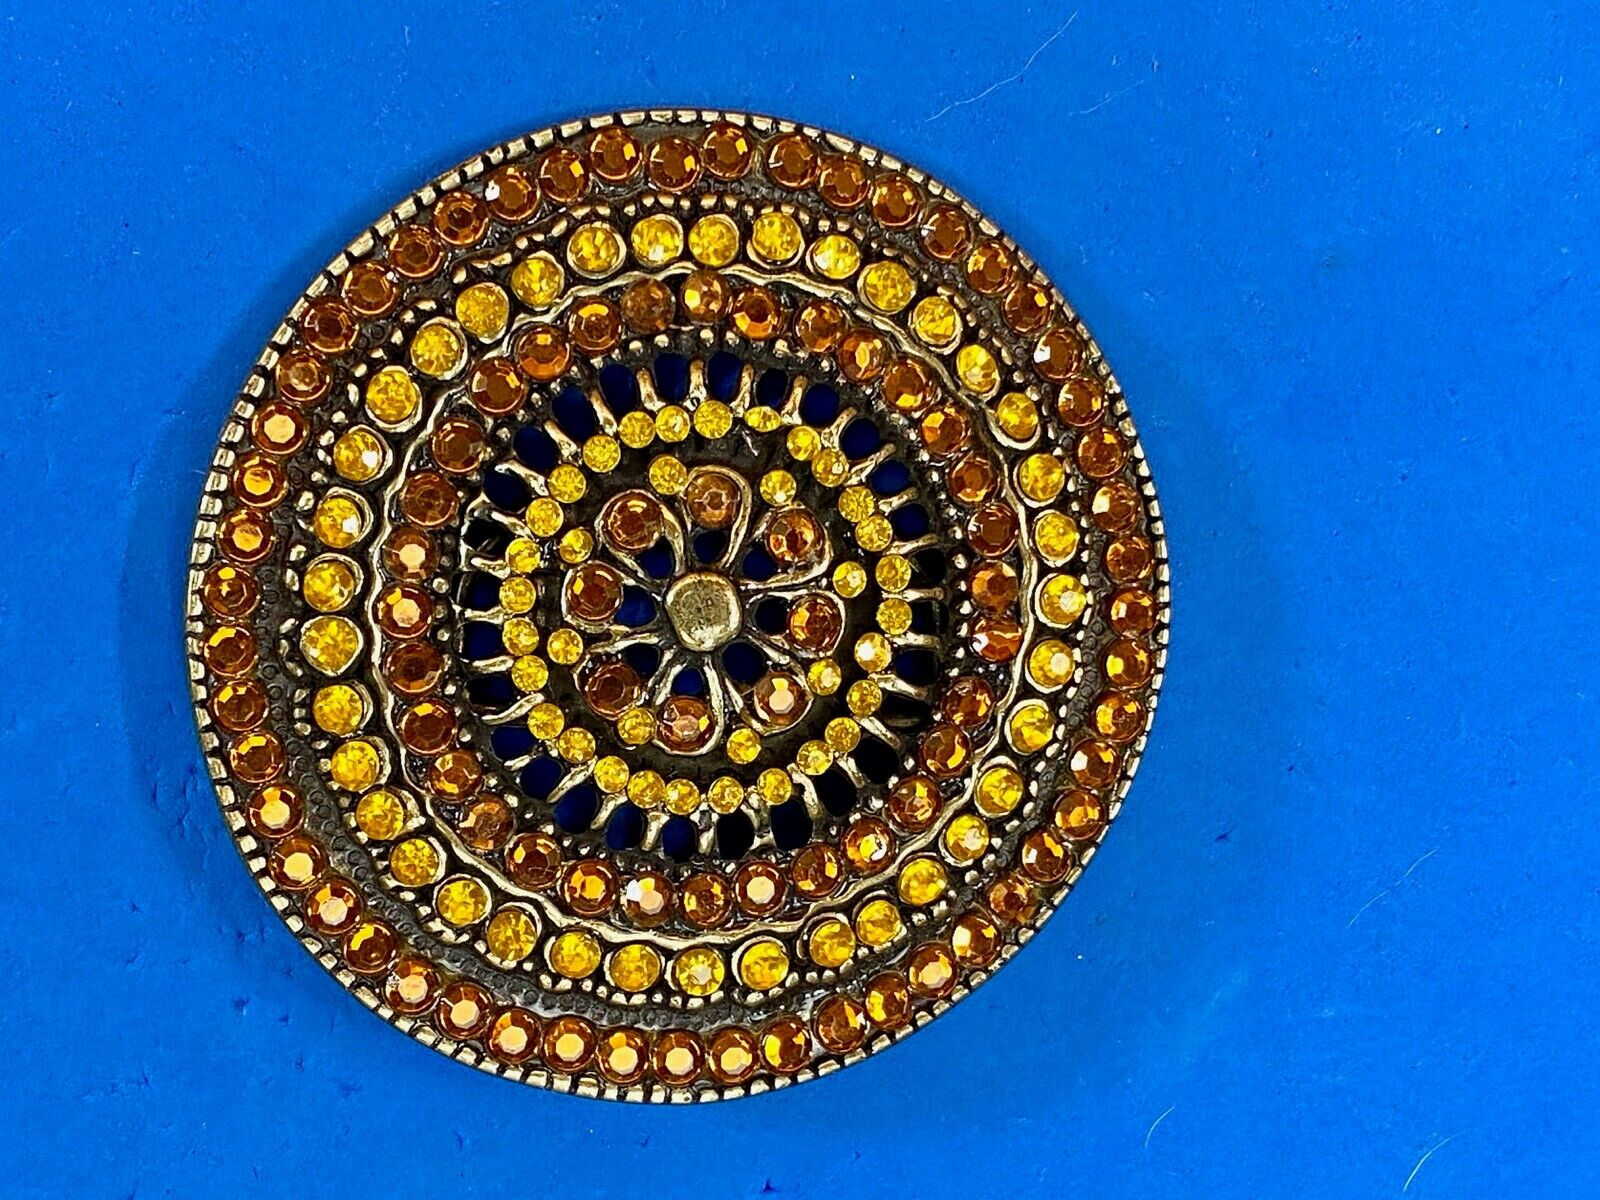 Brown Yellow Mixed Material wheel pattern circular rhinestone belt buckle